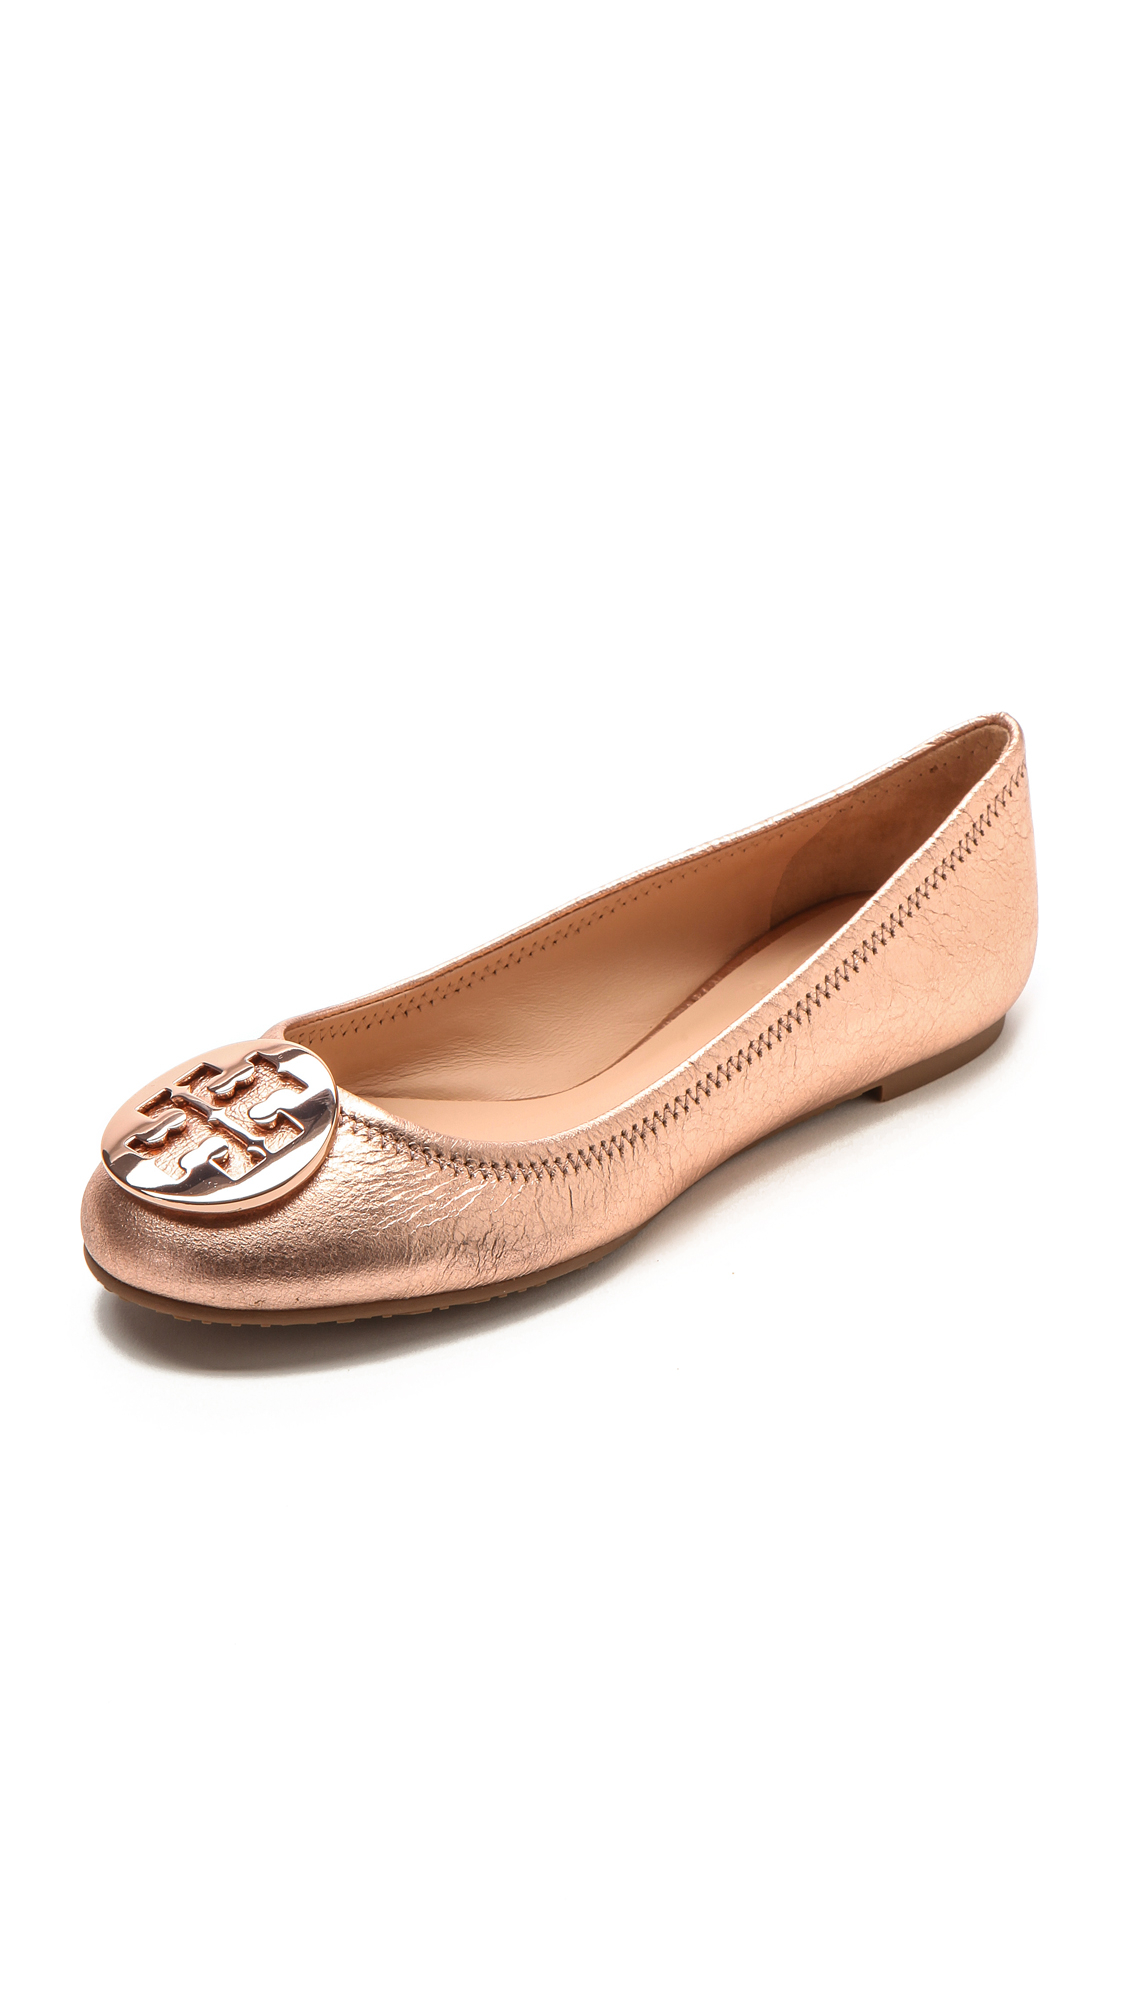 9da212b73185 ... hot lyst tory burch reva ballet flats rose gold in pink 3ba10 2b7ca